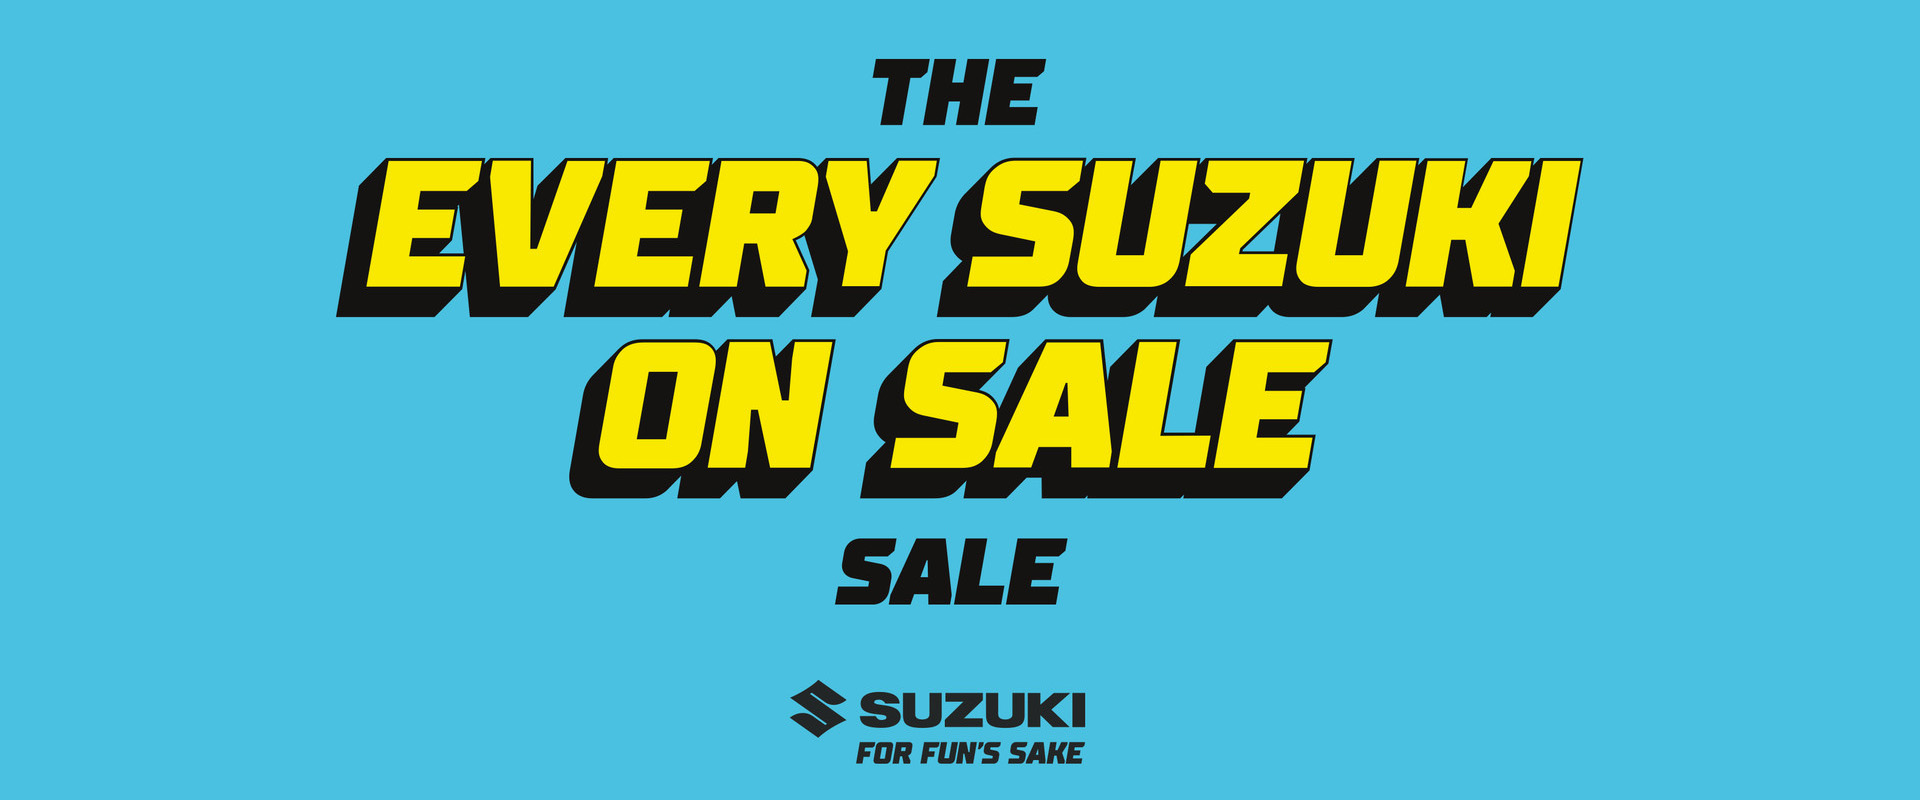 Suzuki - Every Suzuki on Sale